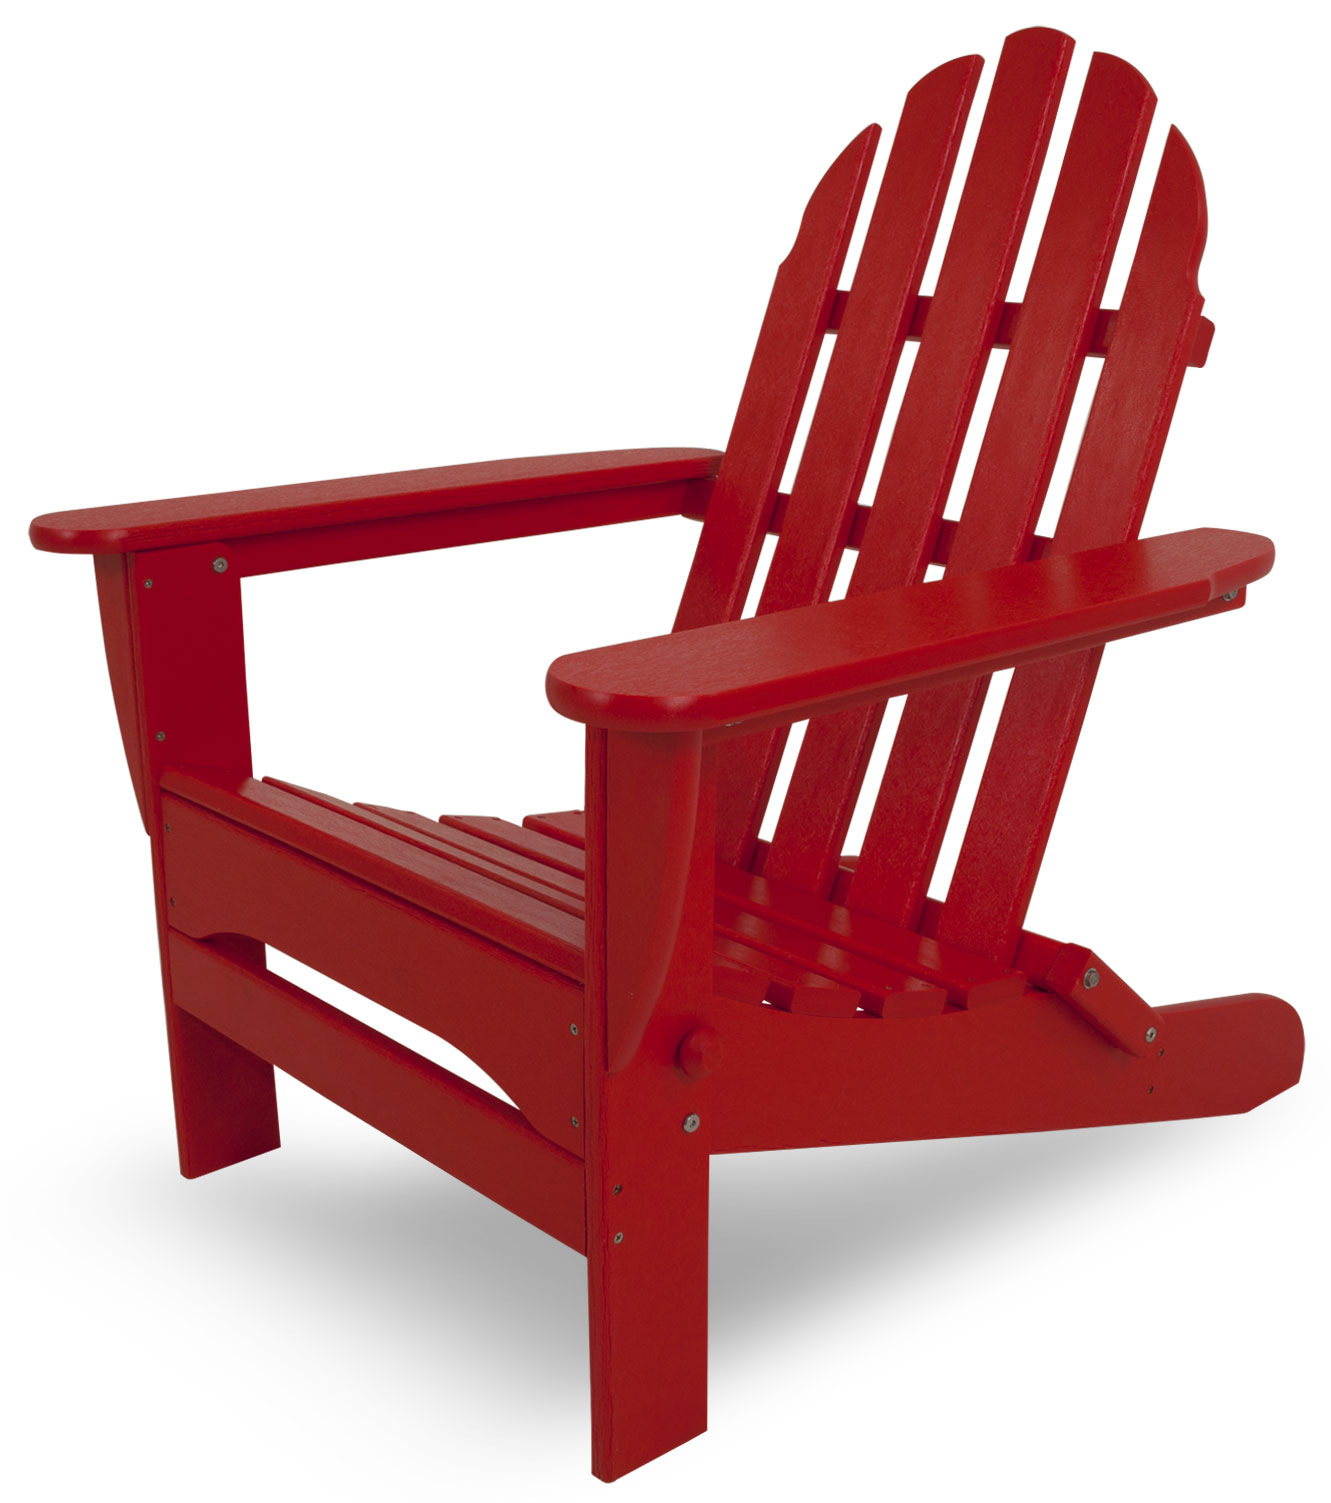 Patio Furniture Refinishing San Diego: Classic Folding Adirondack